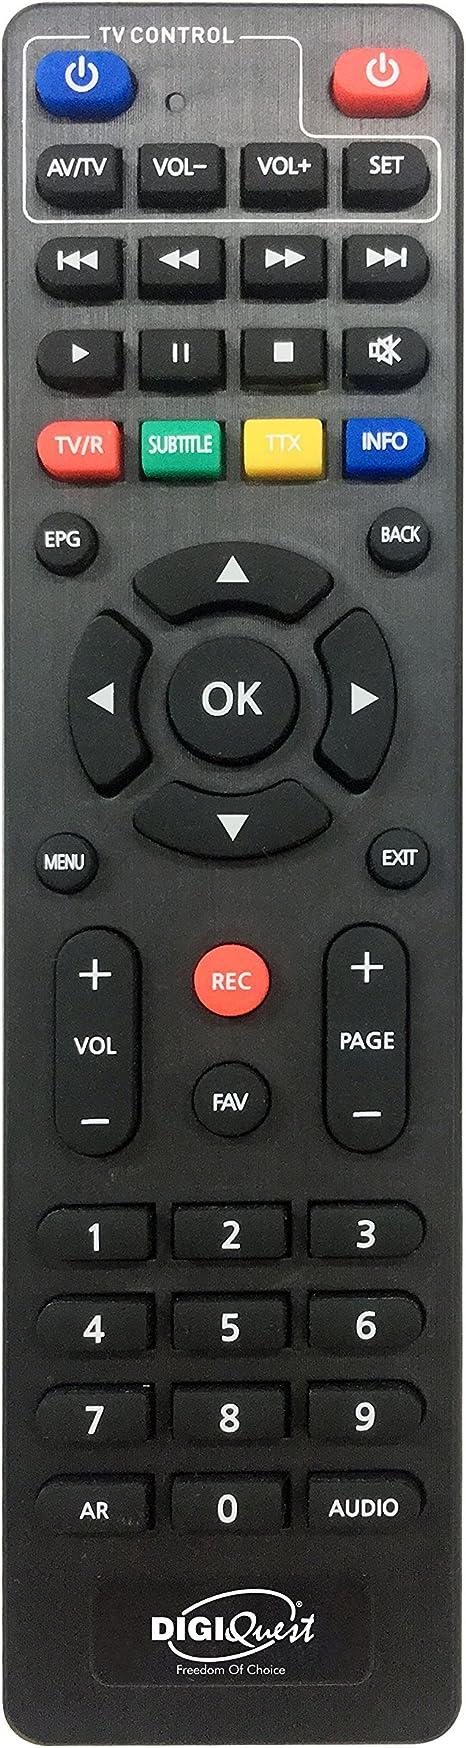 Digiquest Cable de Abel Full HD Cable Receptor Digital DVB-C (HDMI, SCART, LAN, USB, pantalla, botones, 2 en 1 mando a distancia) Incluye cable HDMI